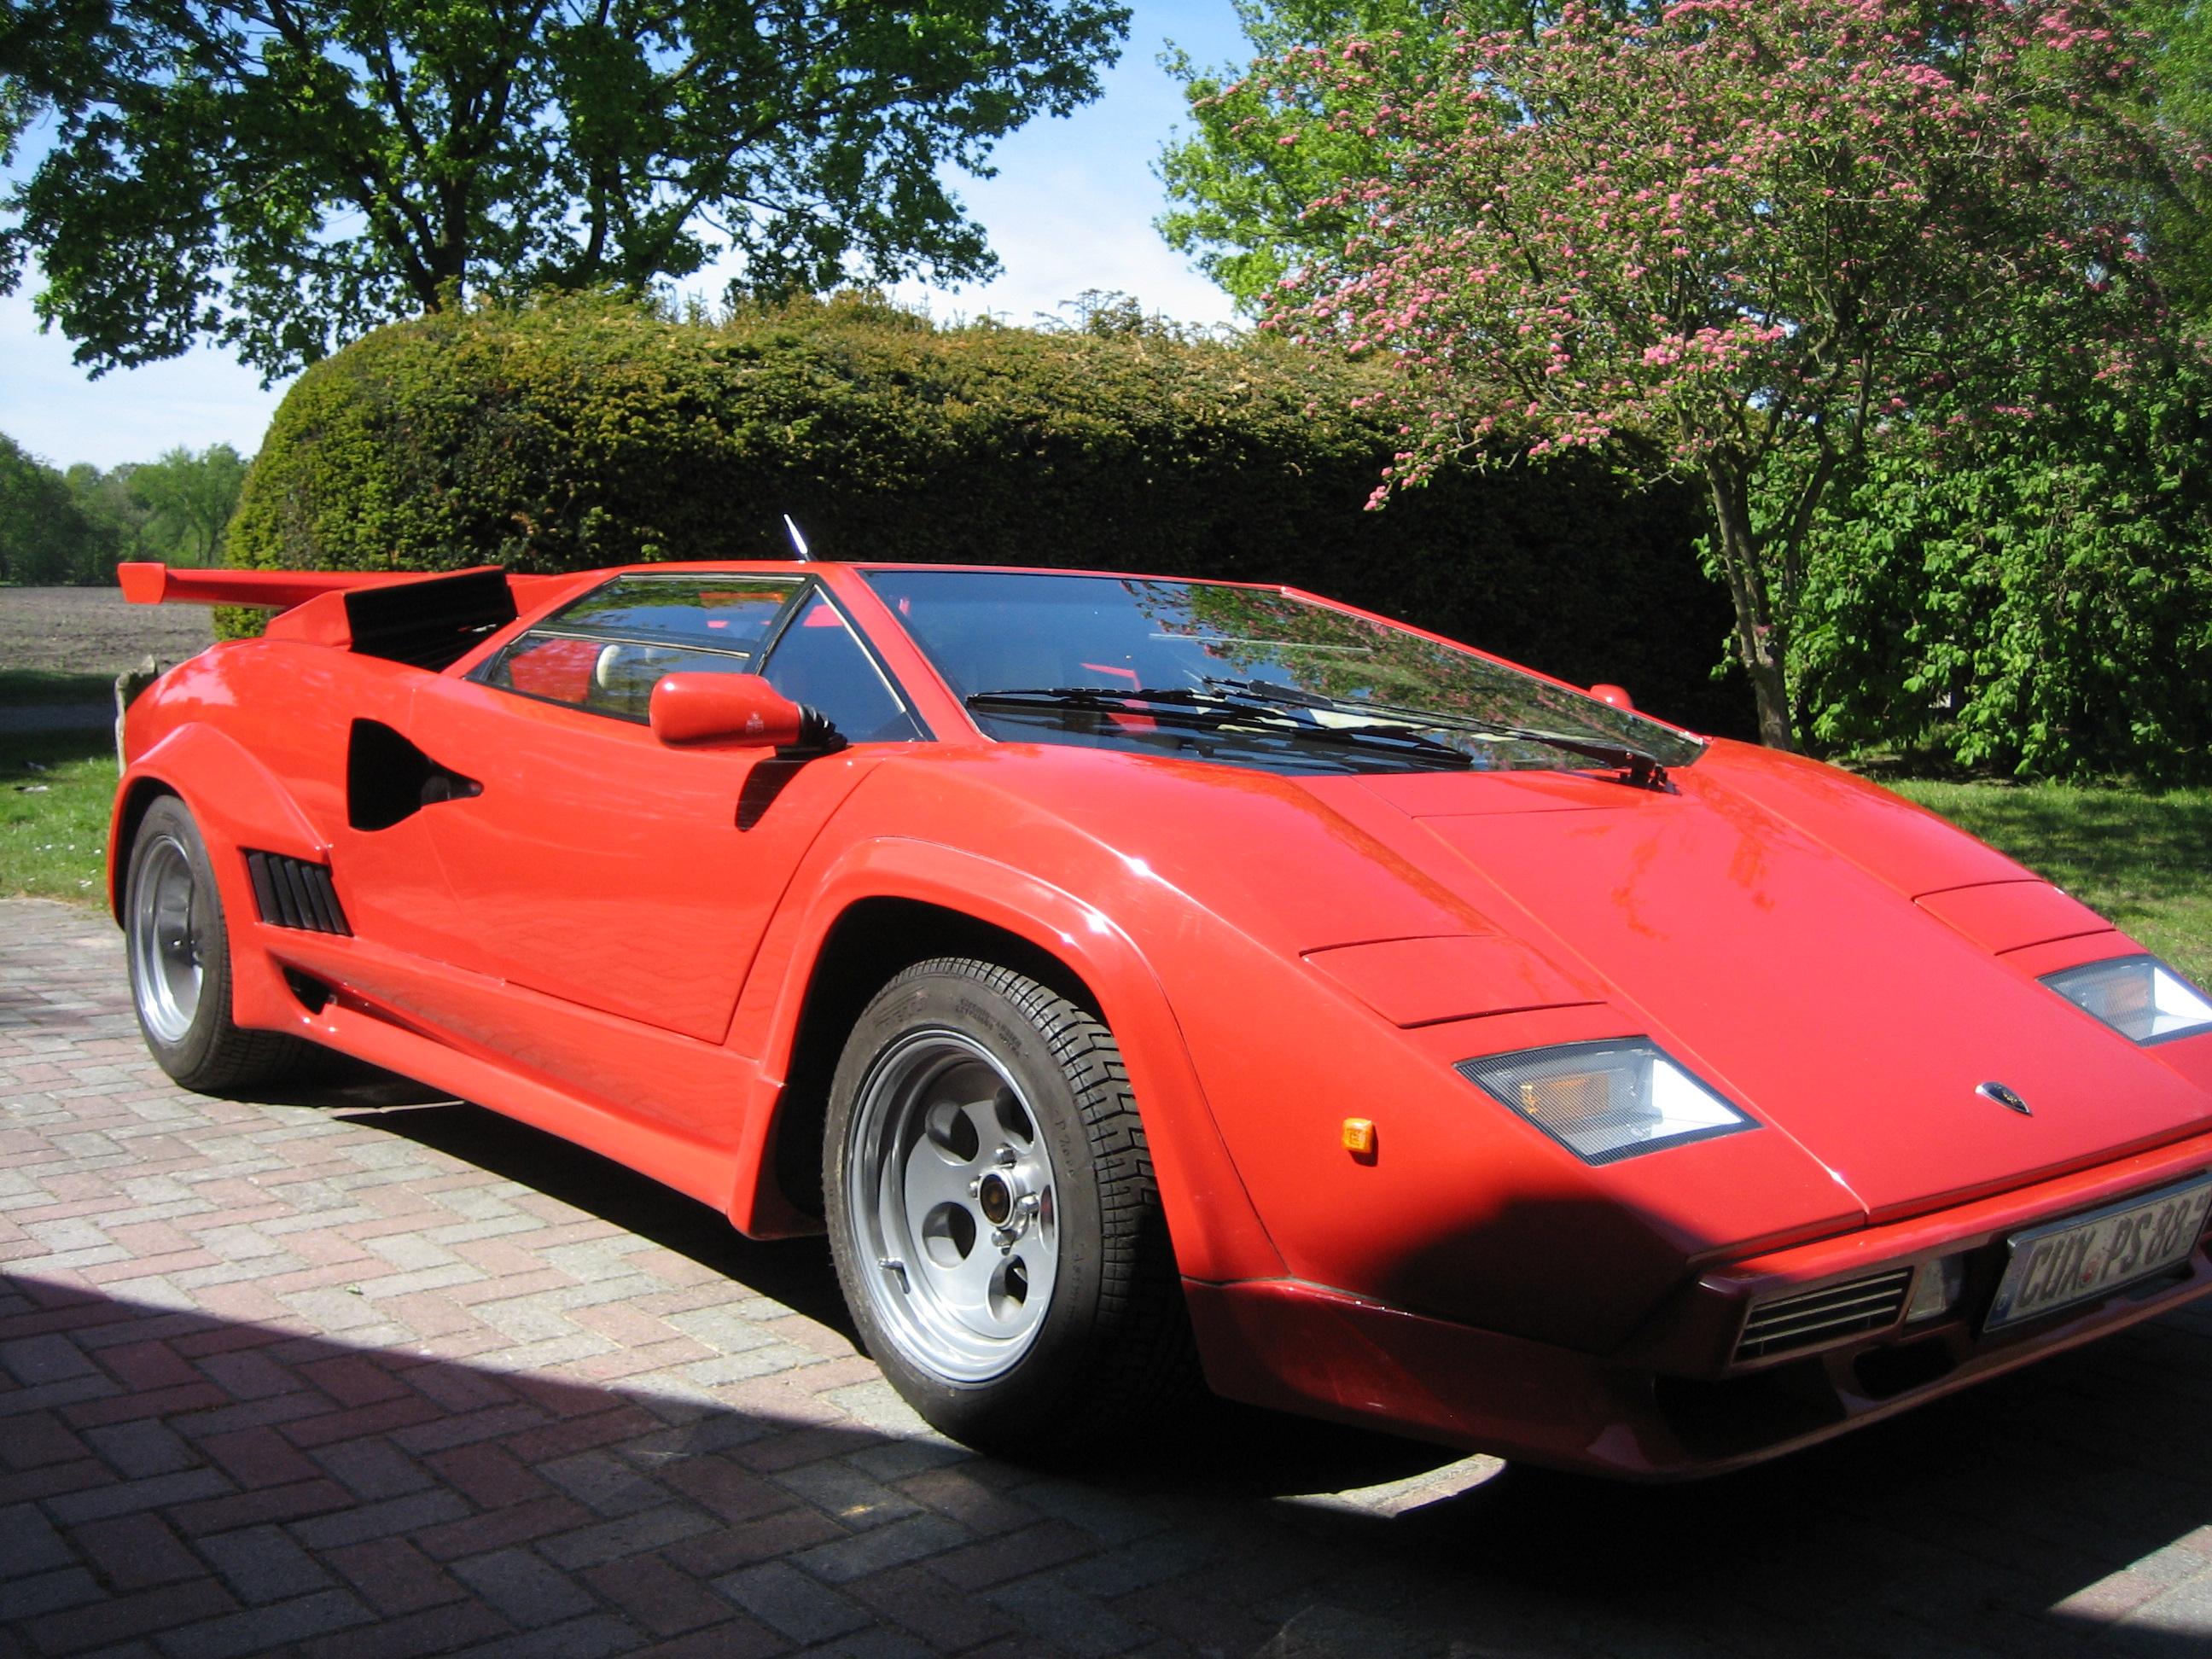 IMG_6524 Wonderful Lamborghini Countach Strohm De Rella Cars Trend